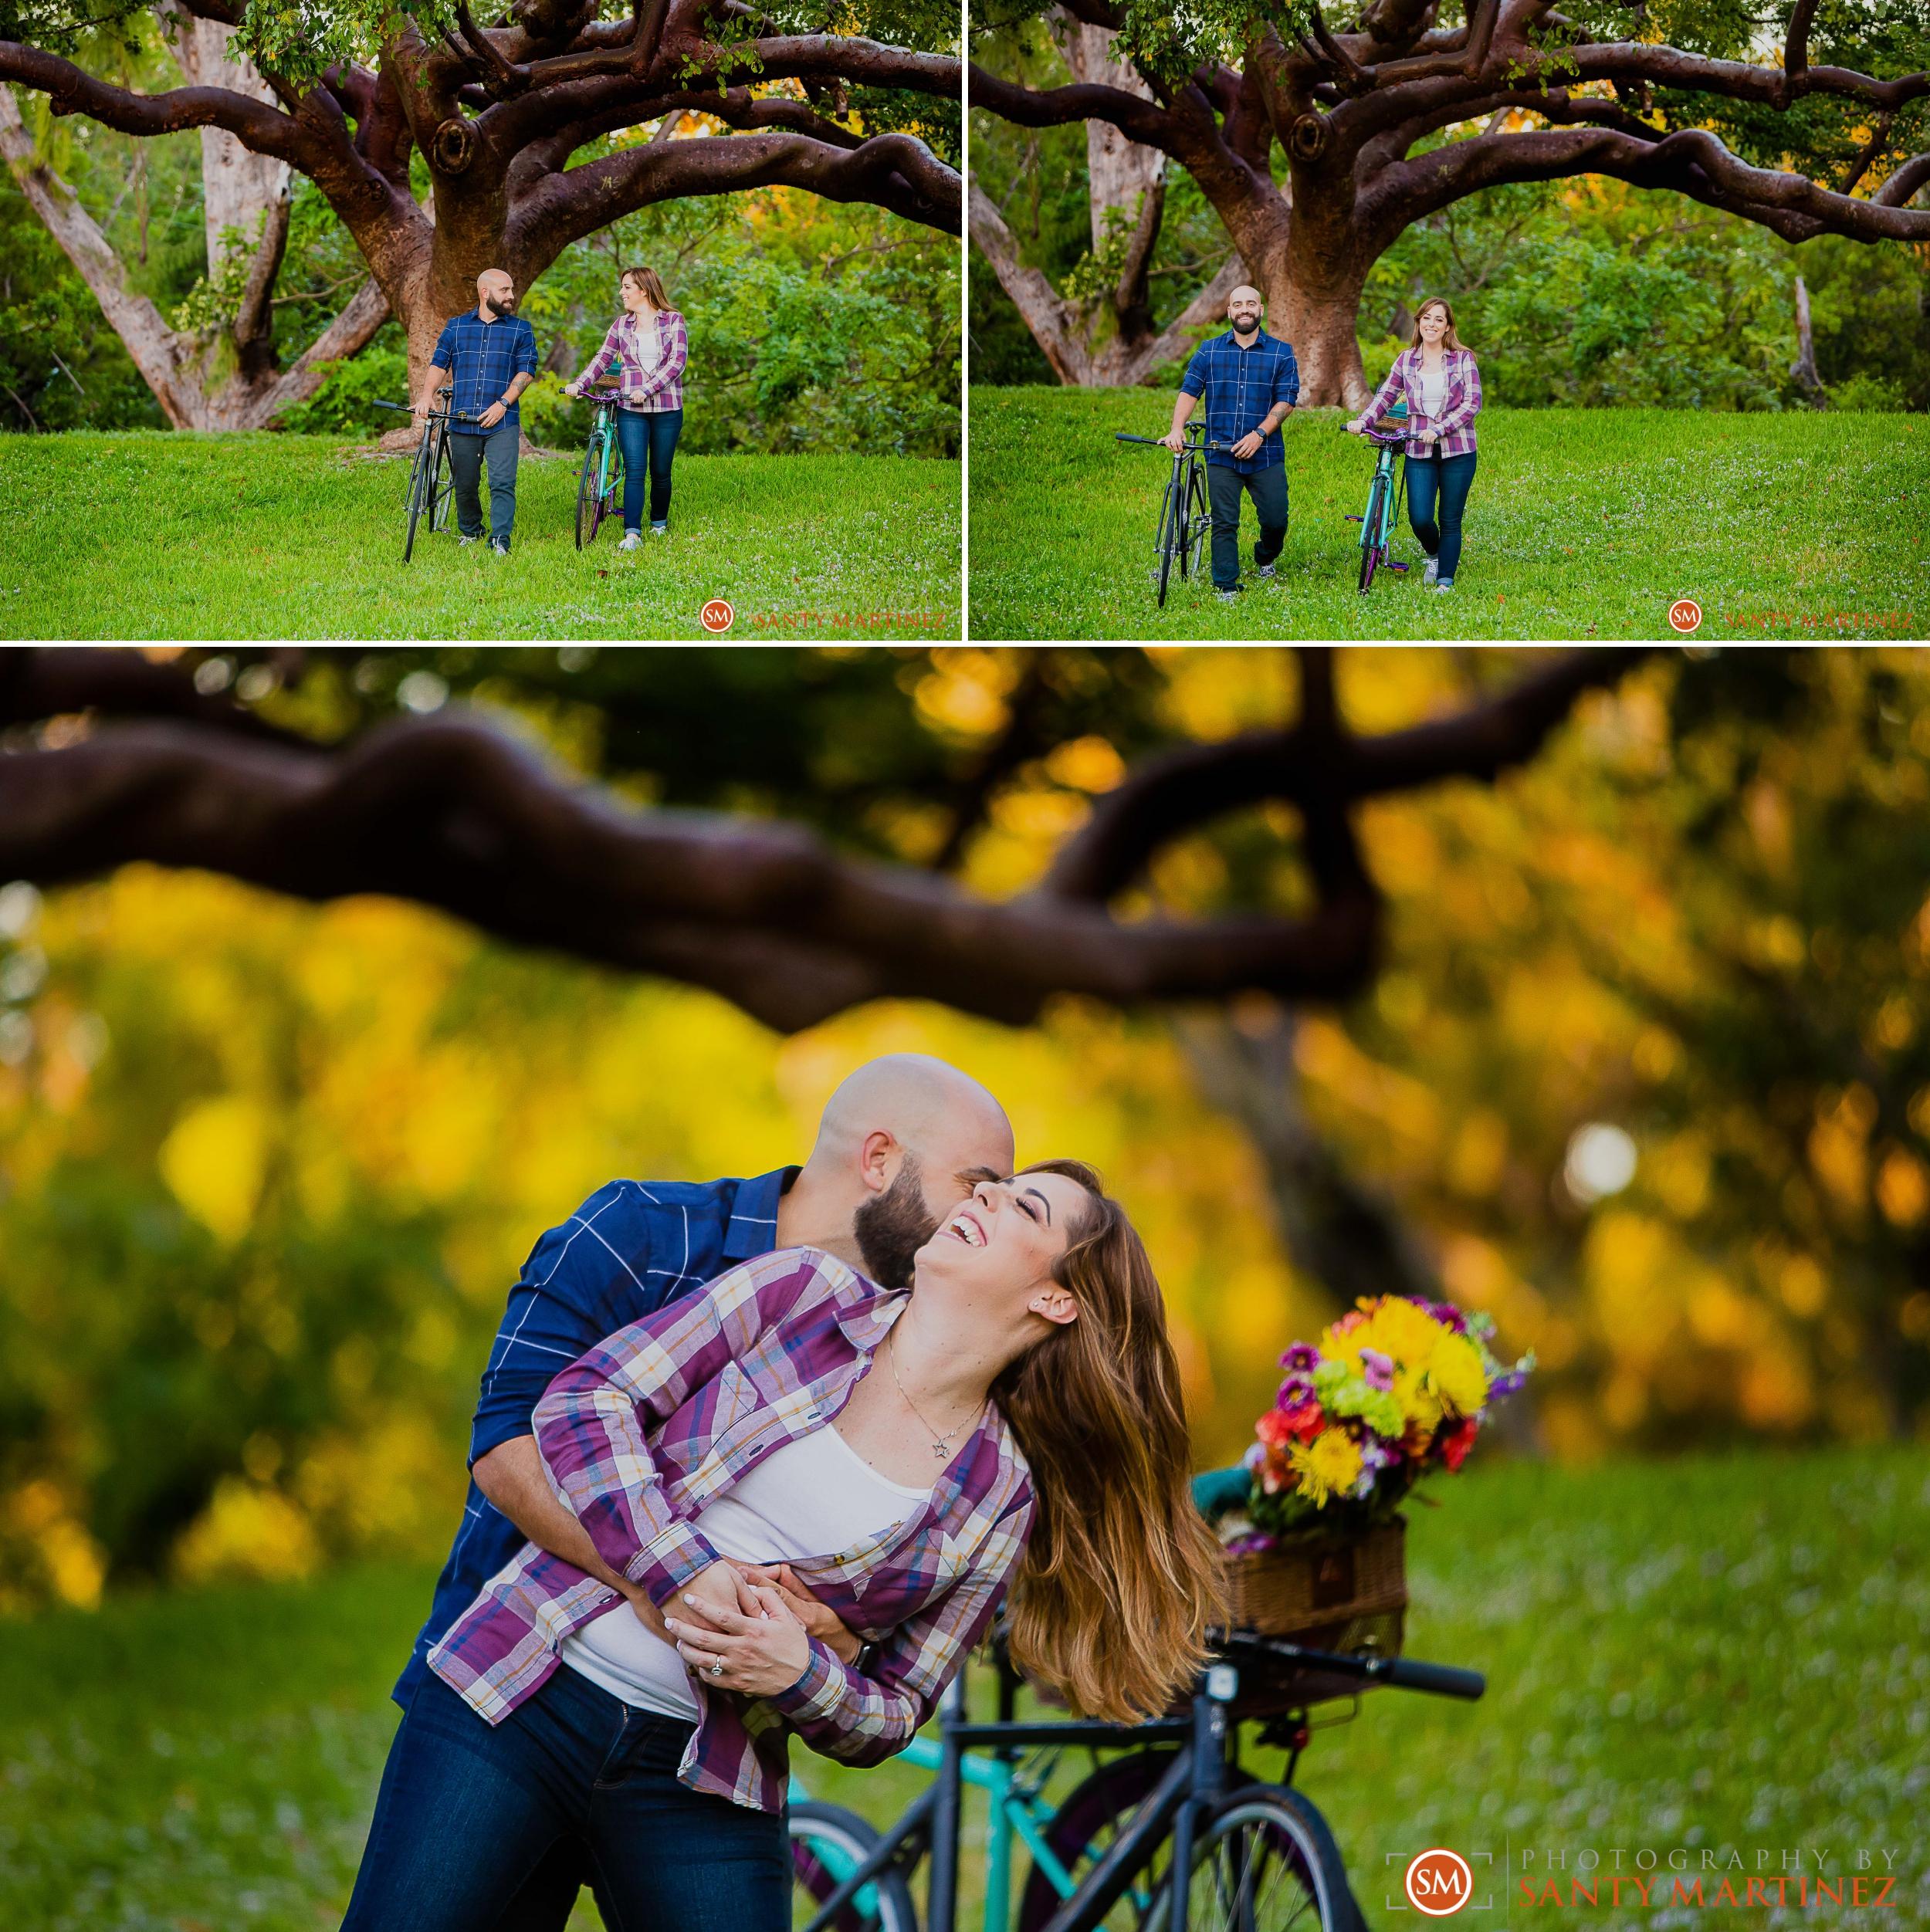 Engagement Session - Greynolds Park - Santy Martinez Photography 5.jpg